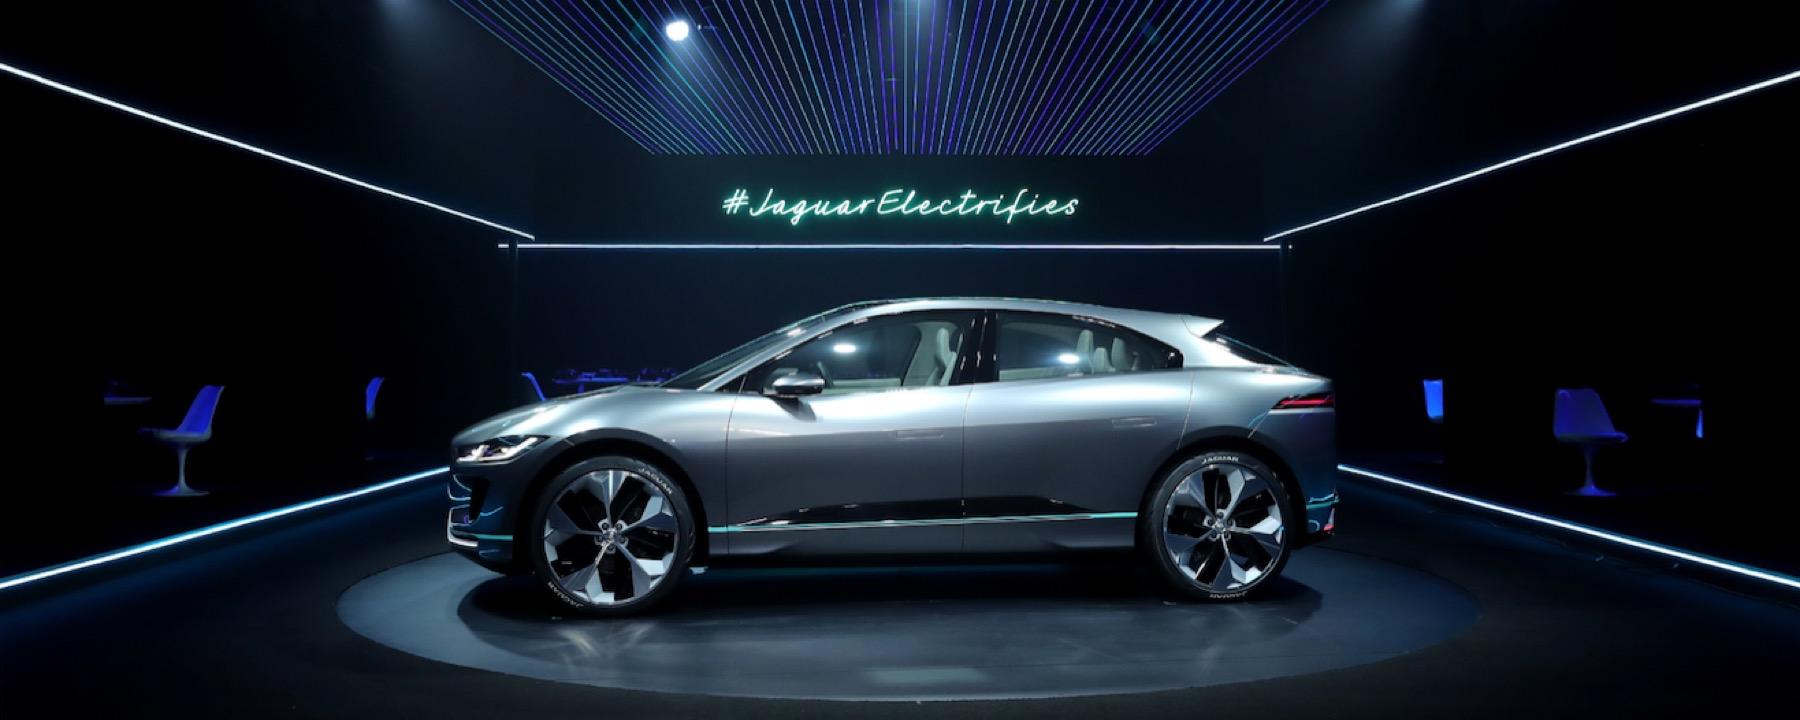 Jaguar Wows With New Concept Car - indiGO Auto Group Blog